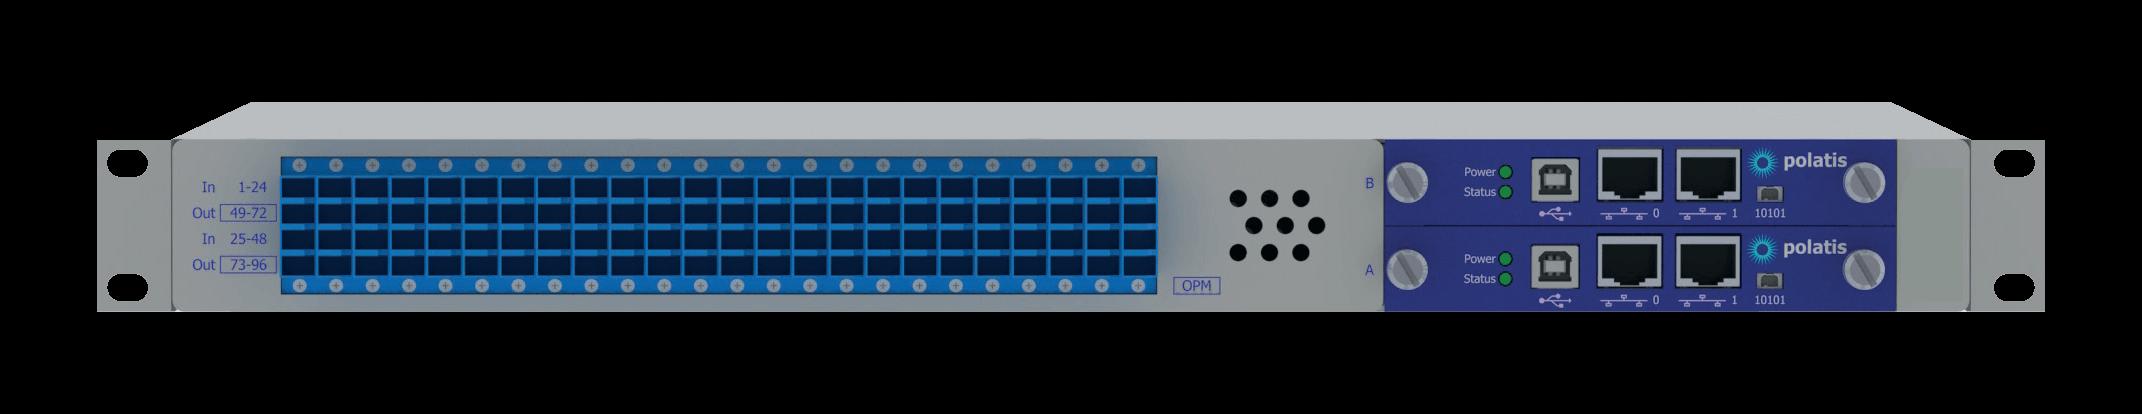 an optical switch